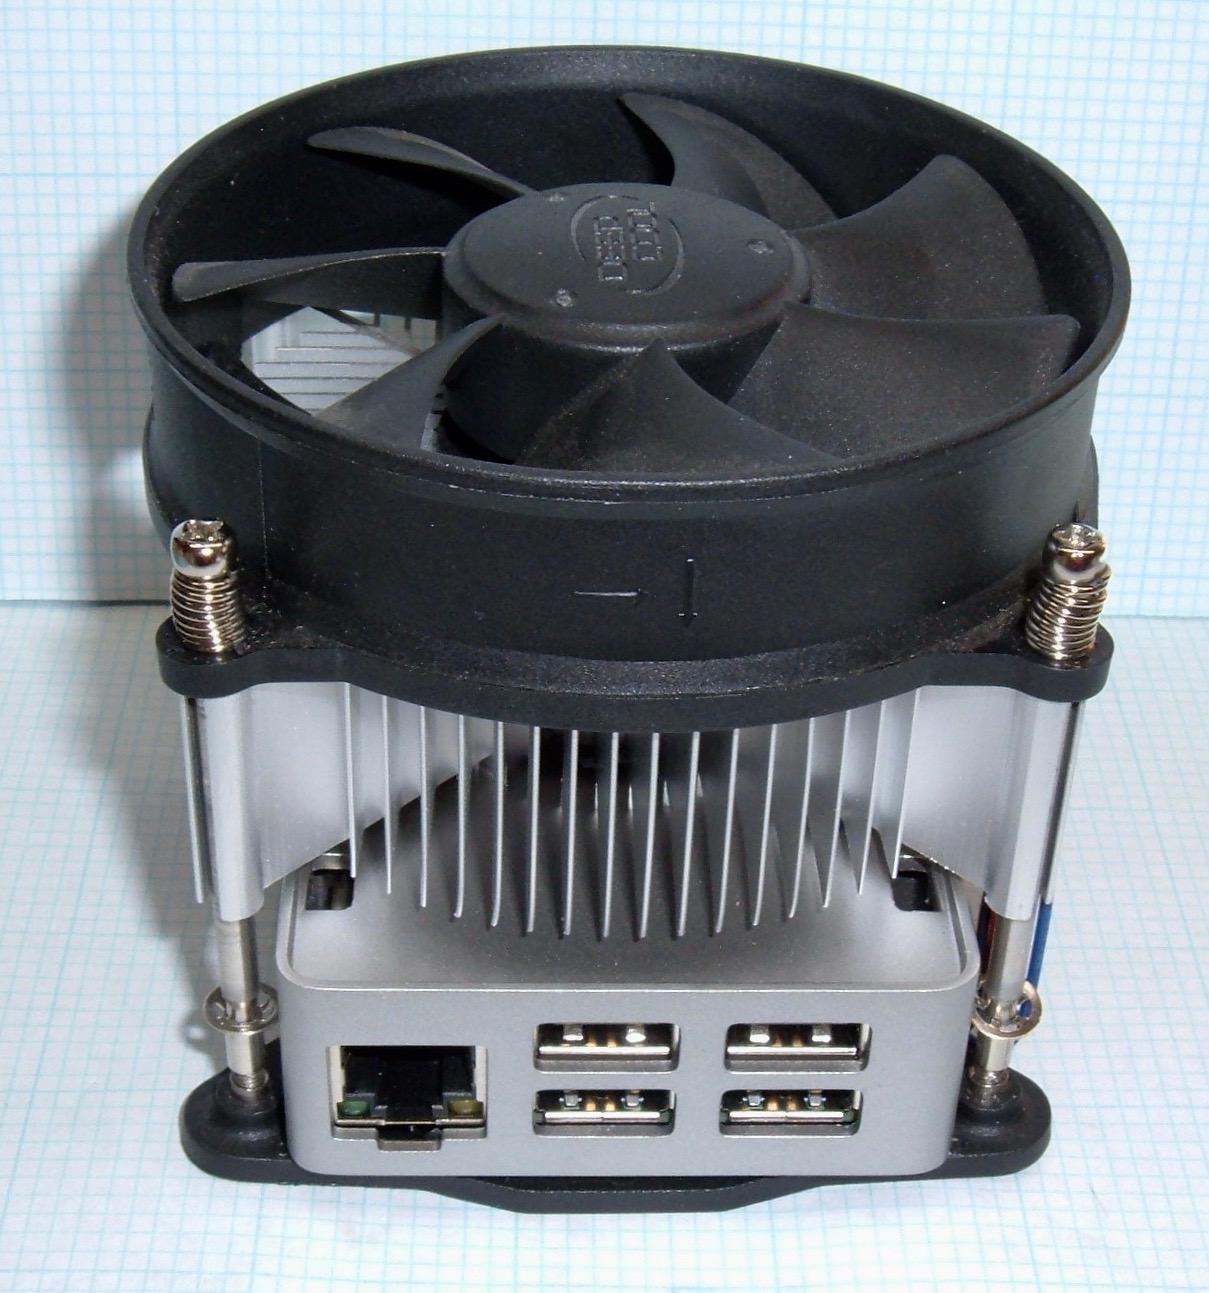 Syonyk's Project Blog: Raspberry Pi 3B+: The FLIRC Case